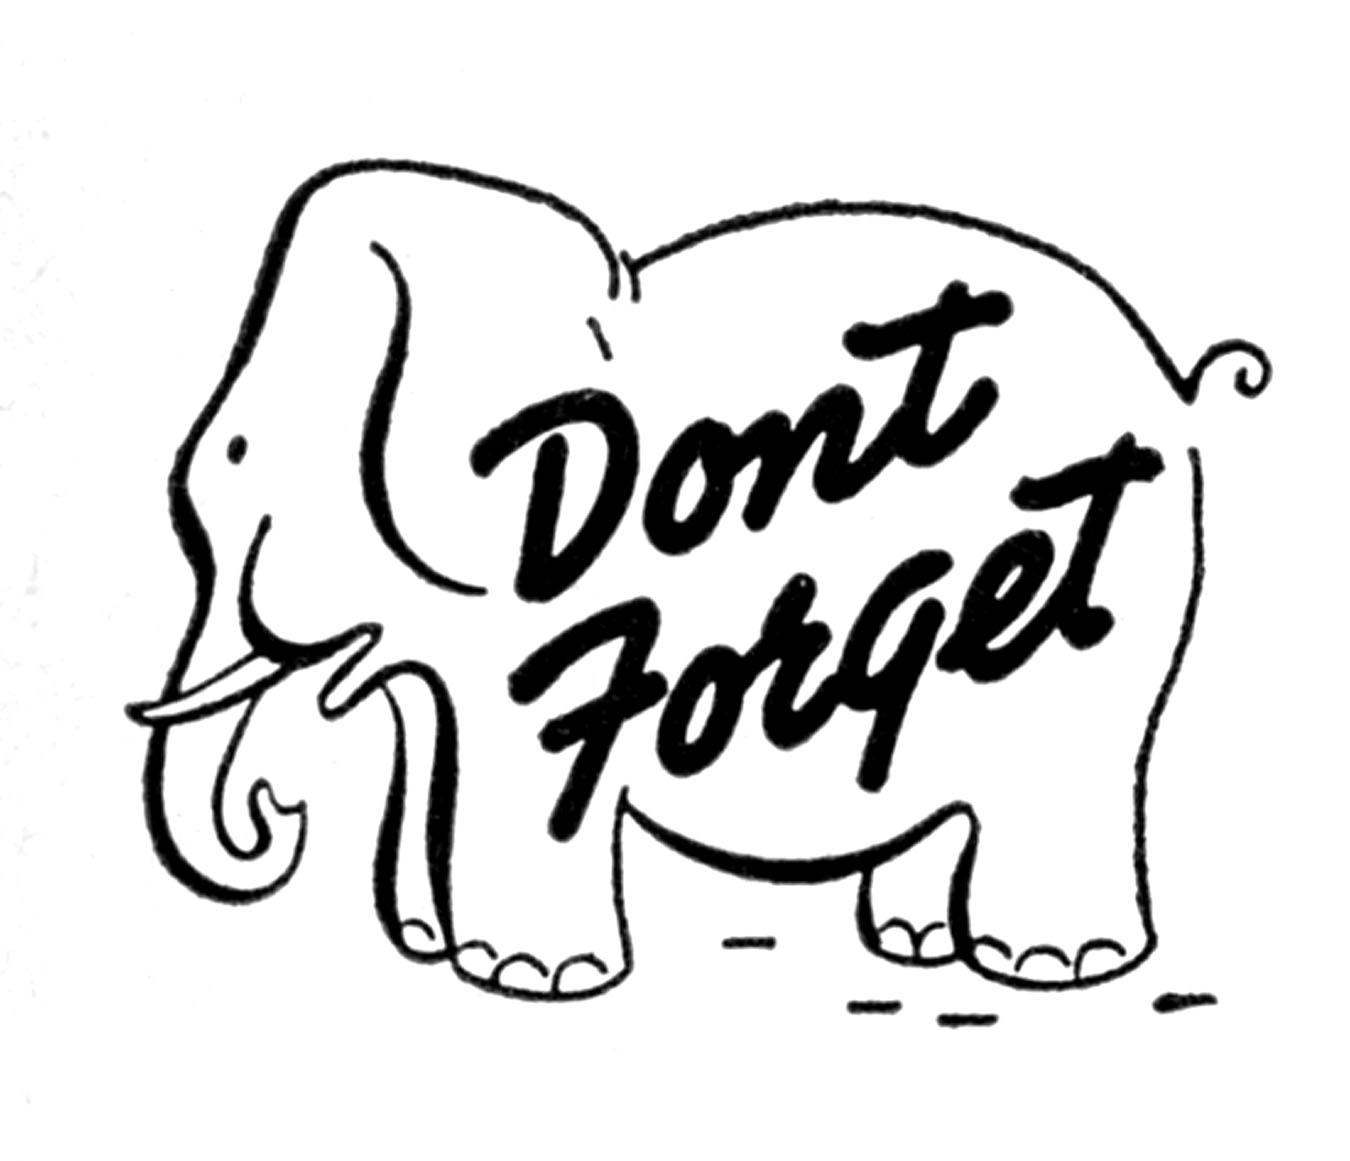 Reminder Clip Art. Reminder Cliparts-Reminder Clip Art. Reminder cliparts-8